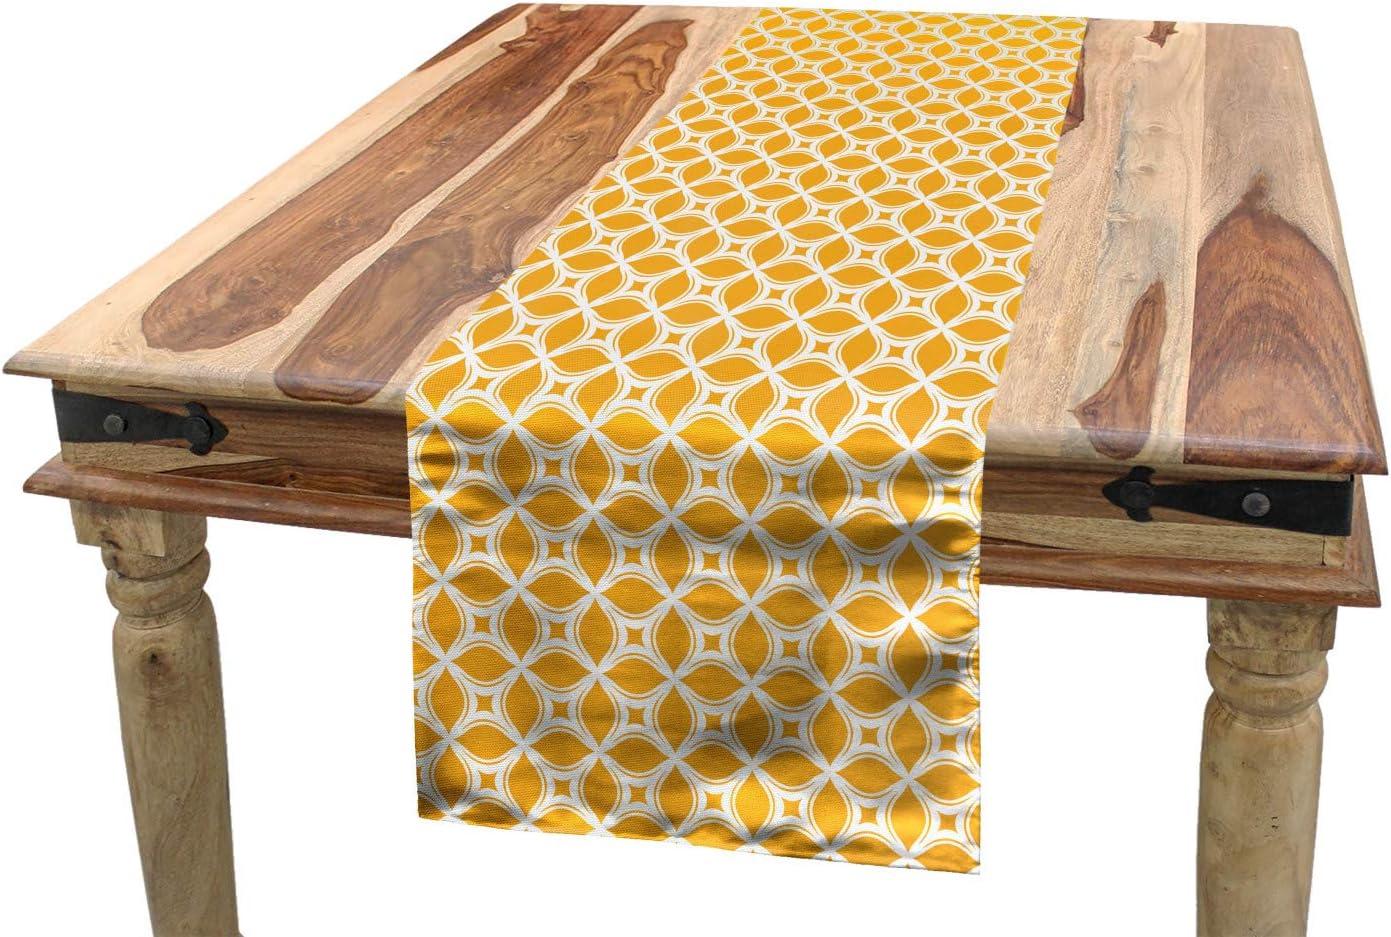 Amazon Com Ambesonne Ethnic Table Runner Ornamental Floral Tiles Mosaic Oriental Lattice Design Geometric Dining Room Kitchen Rectangular Runner 16 X 120 Orange And White Home Kitchen